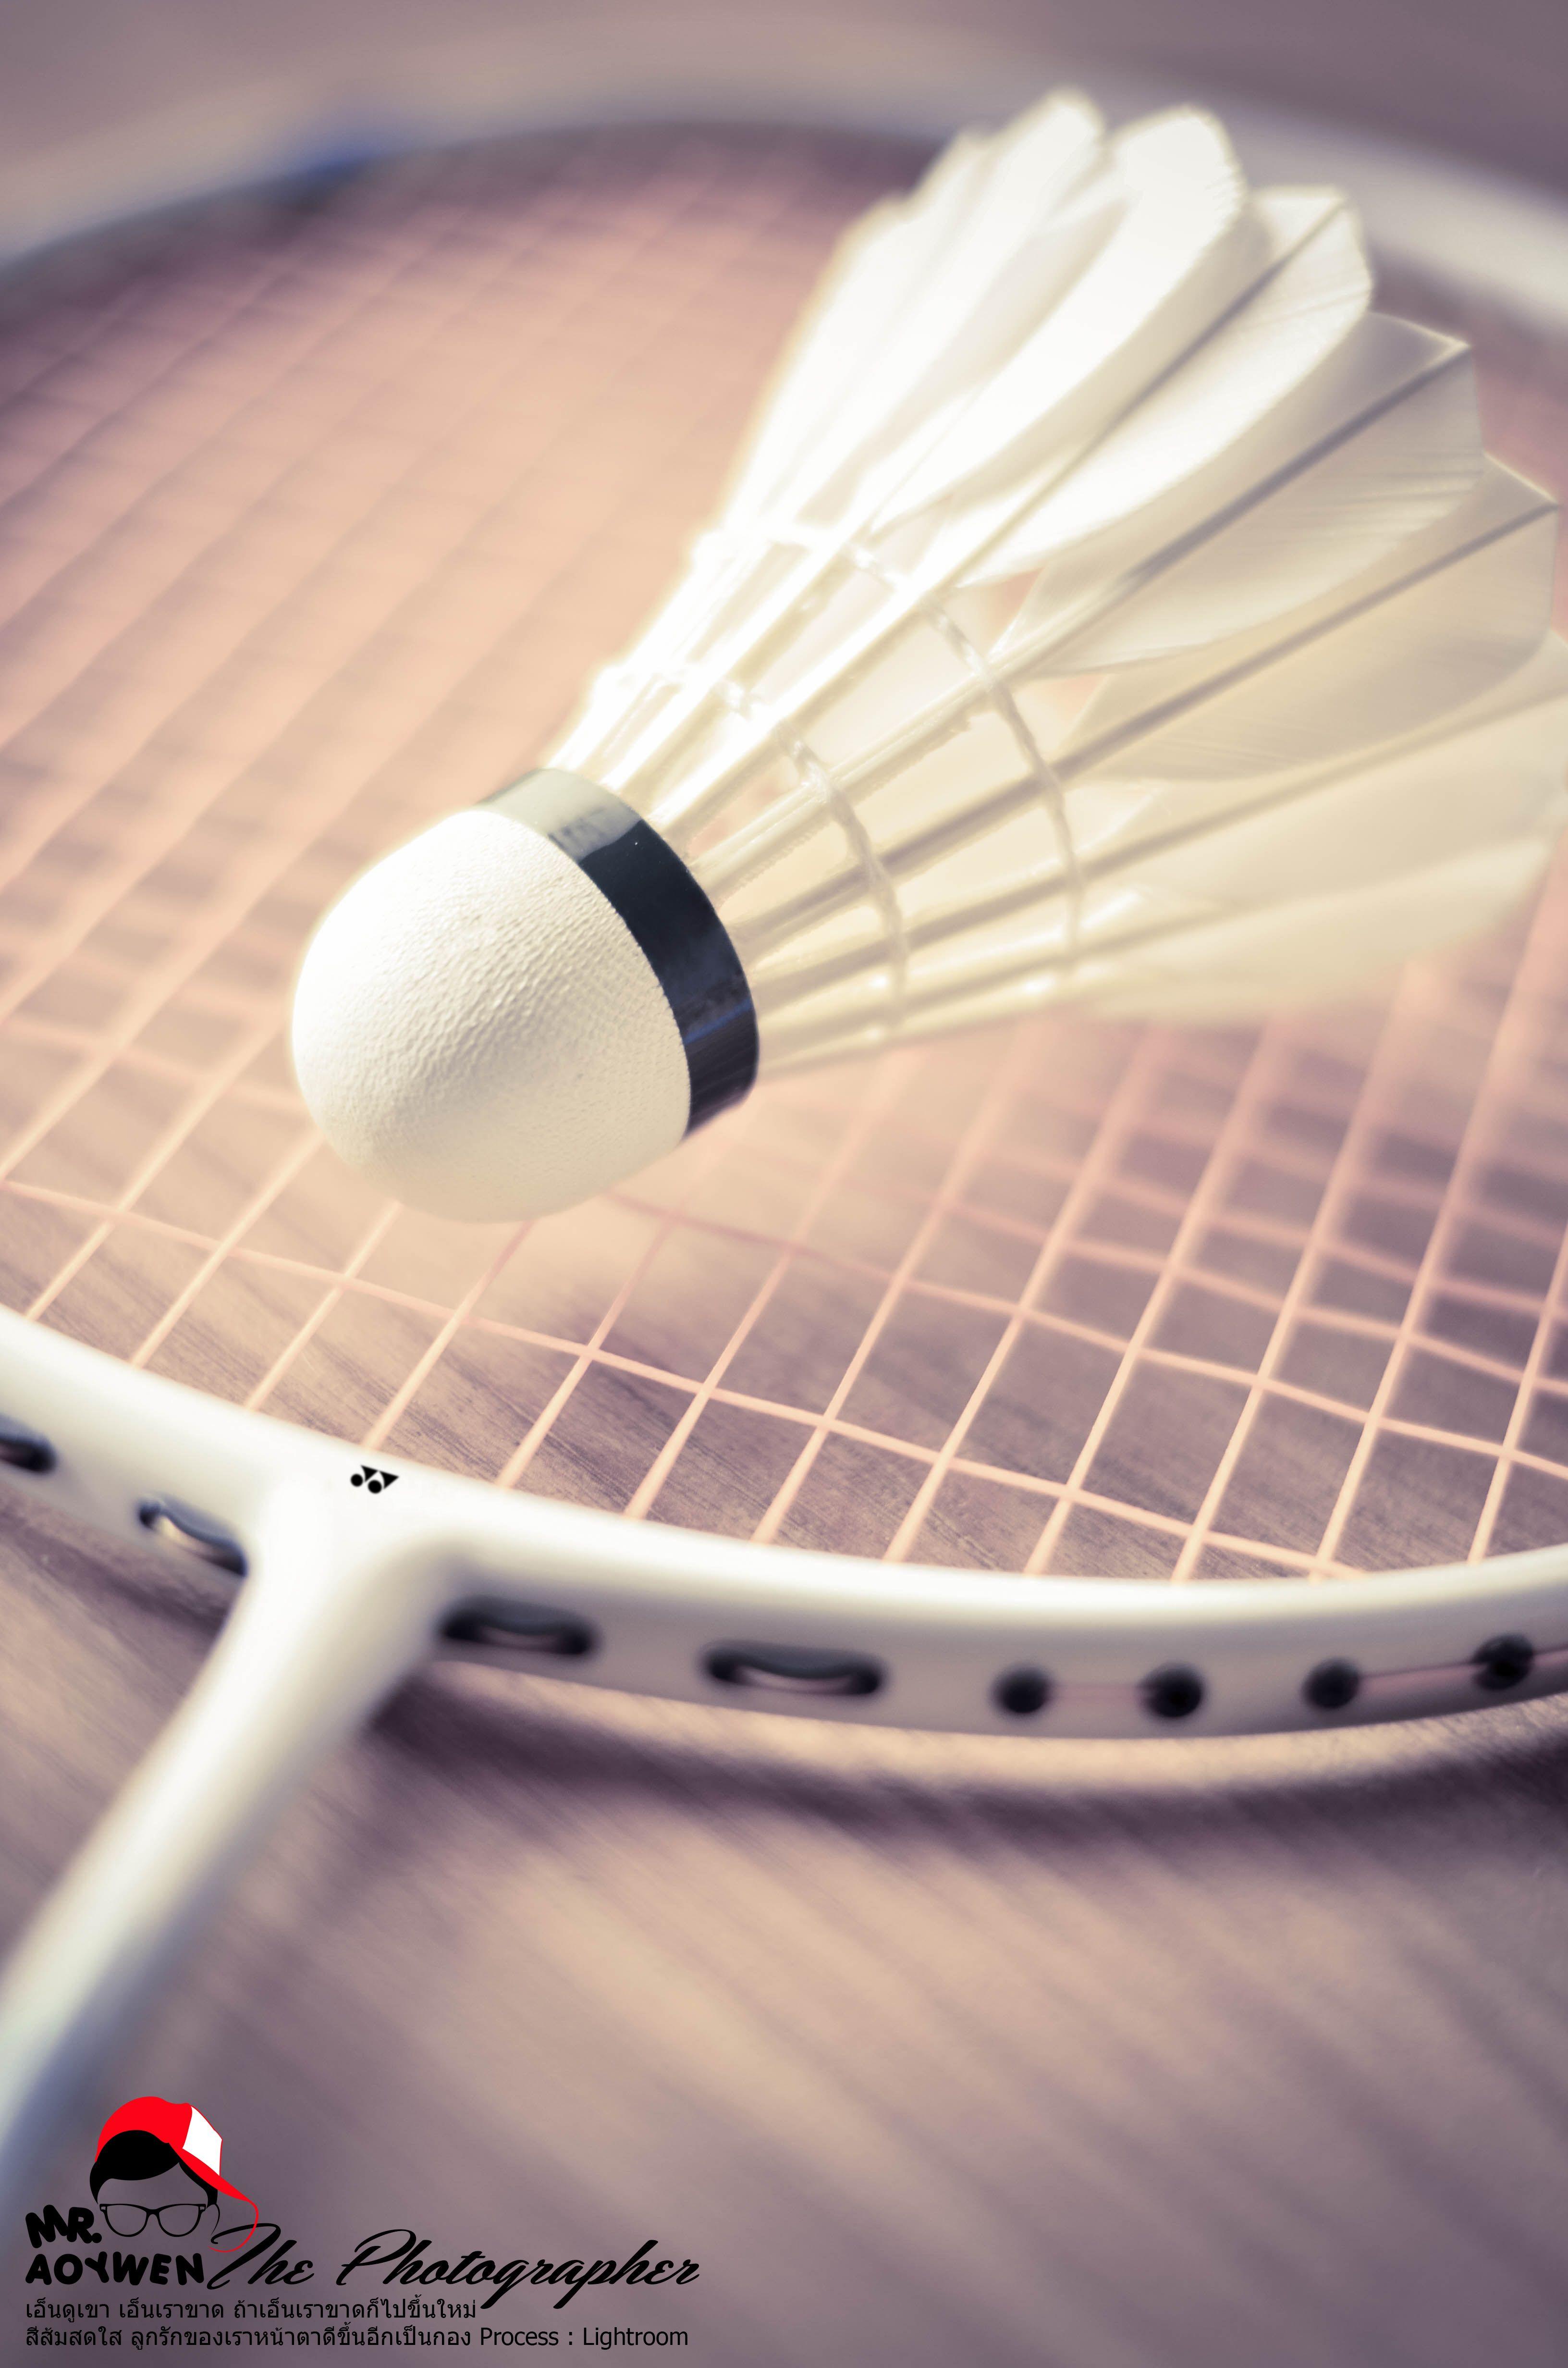 Badminton League - Apps on Google Play